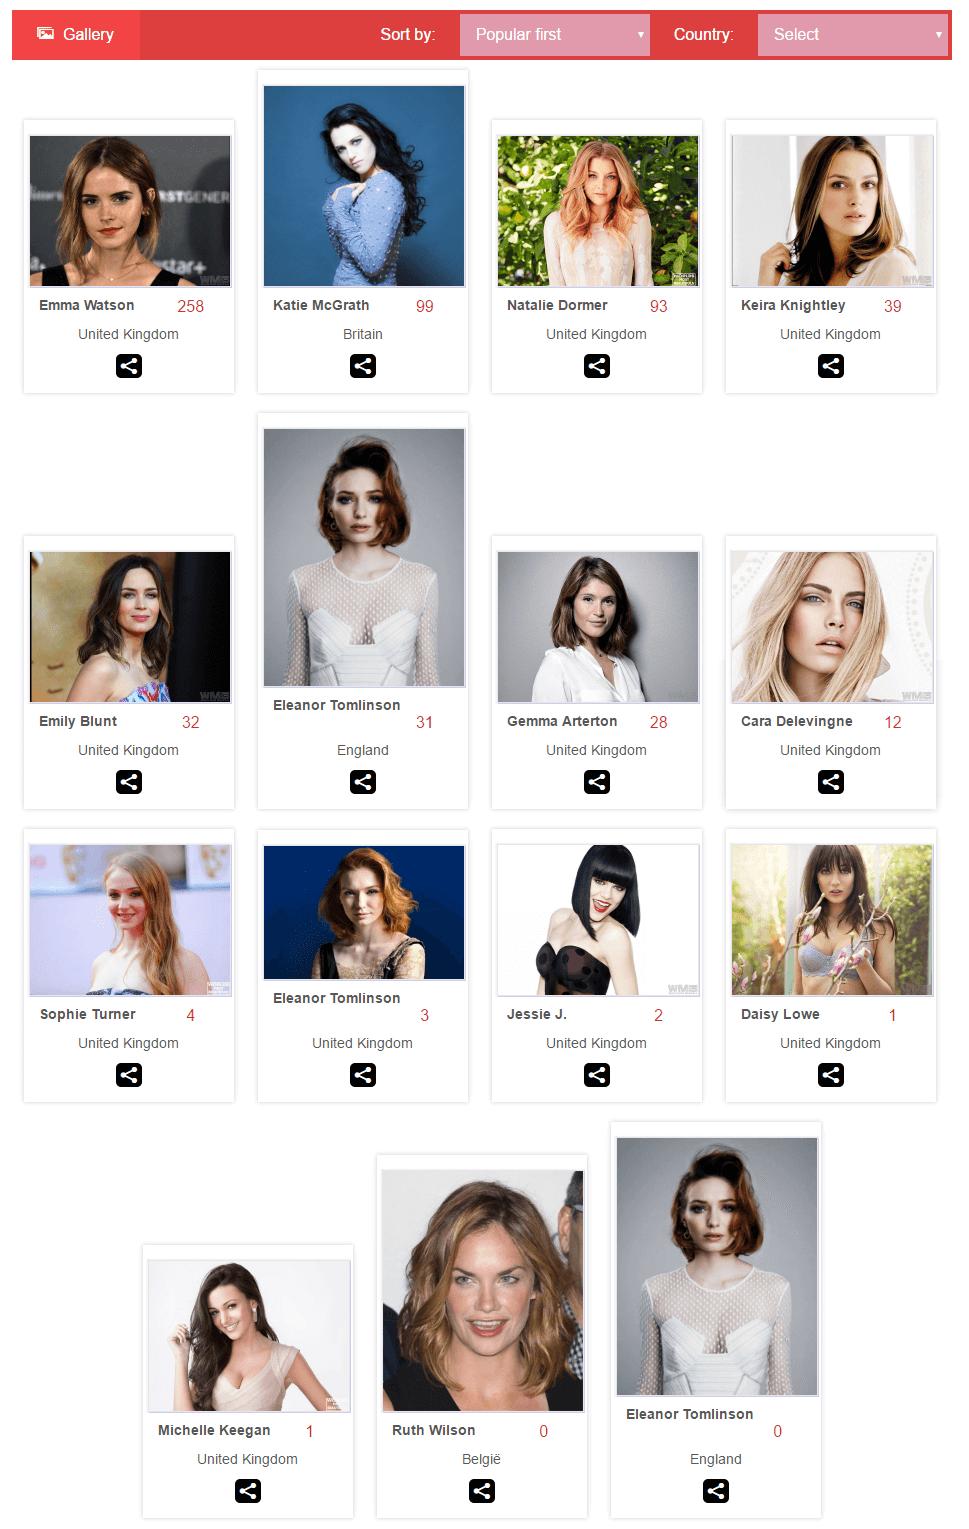 Most_Beautiful_British_Women_2016_Poll_results